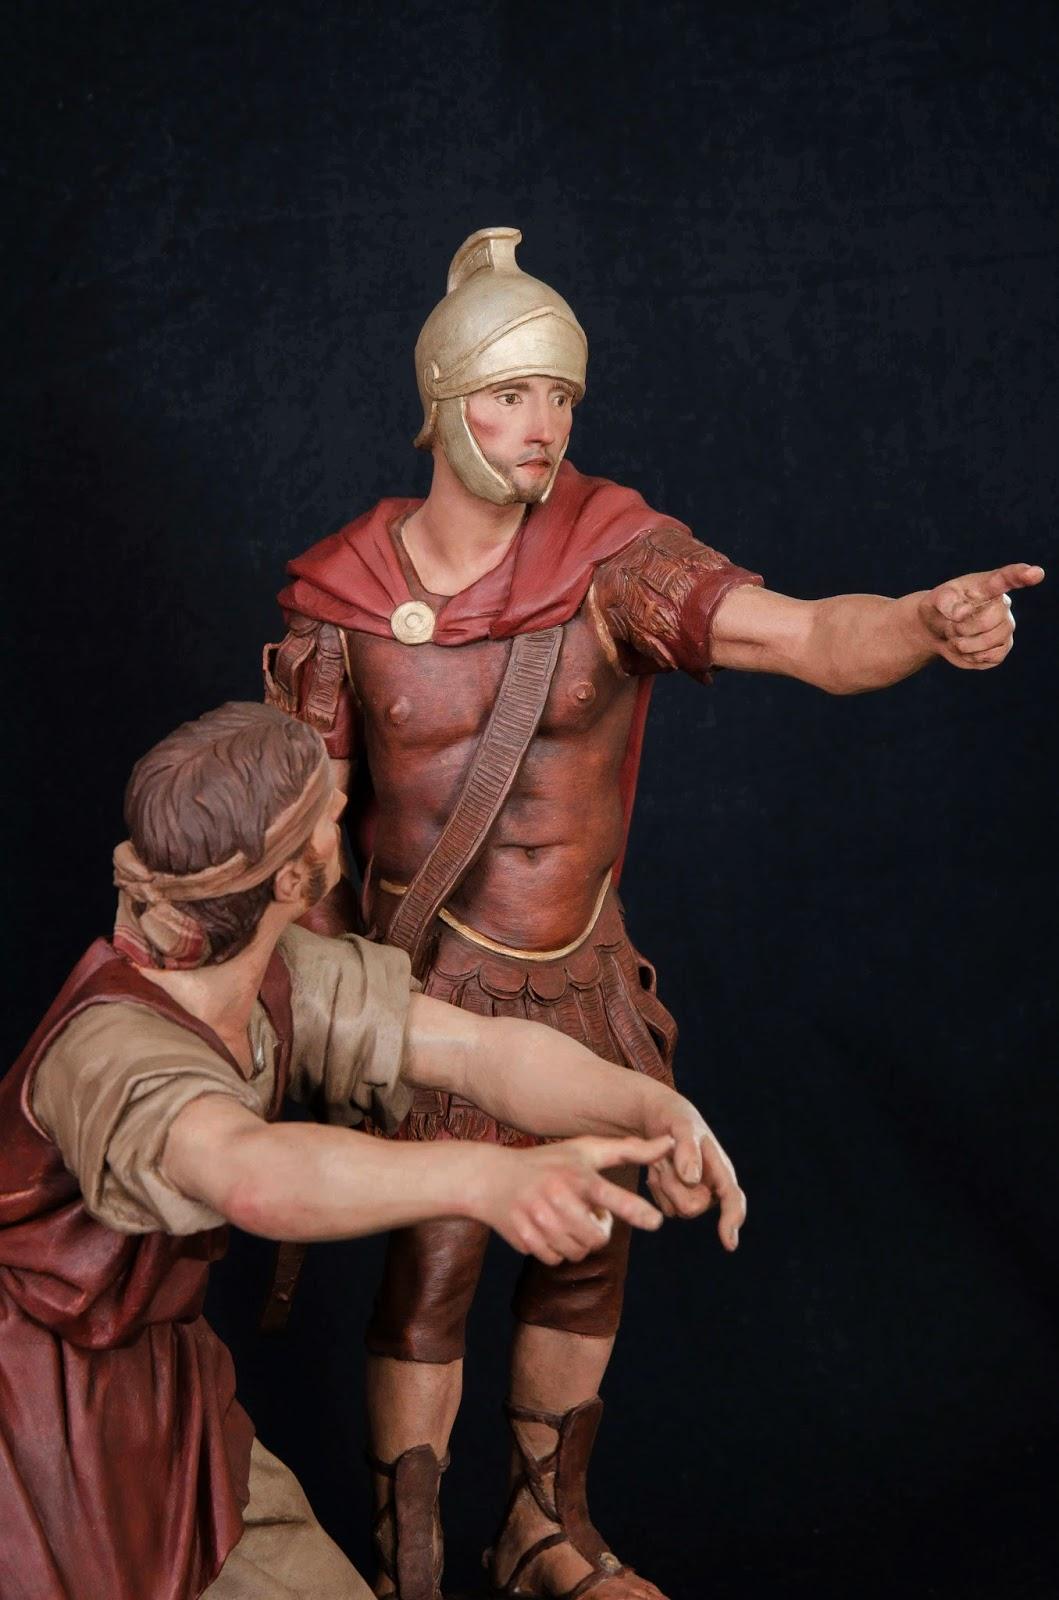 Belén presepe nativity krippe Arturo Serra escultura barro cocido 17